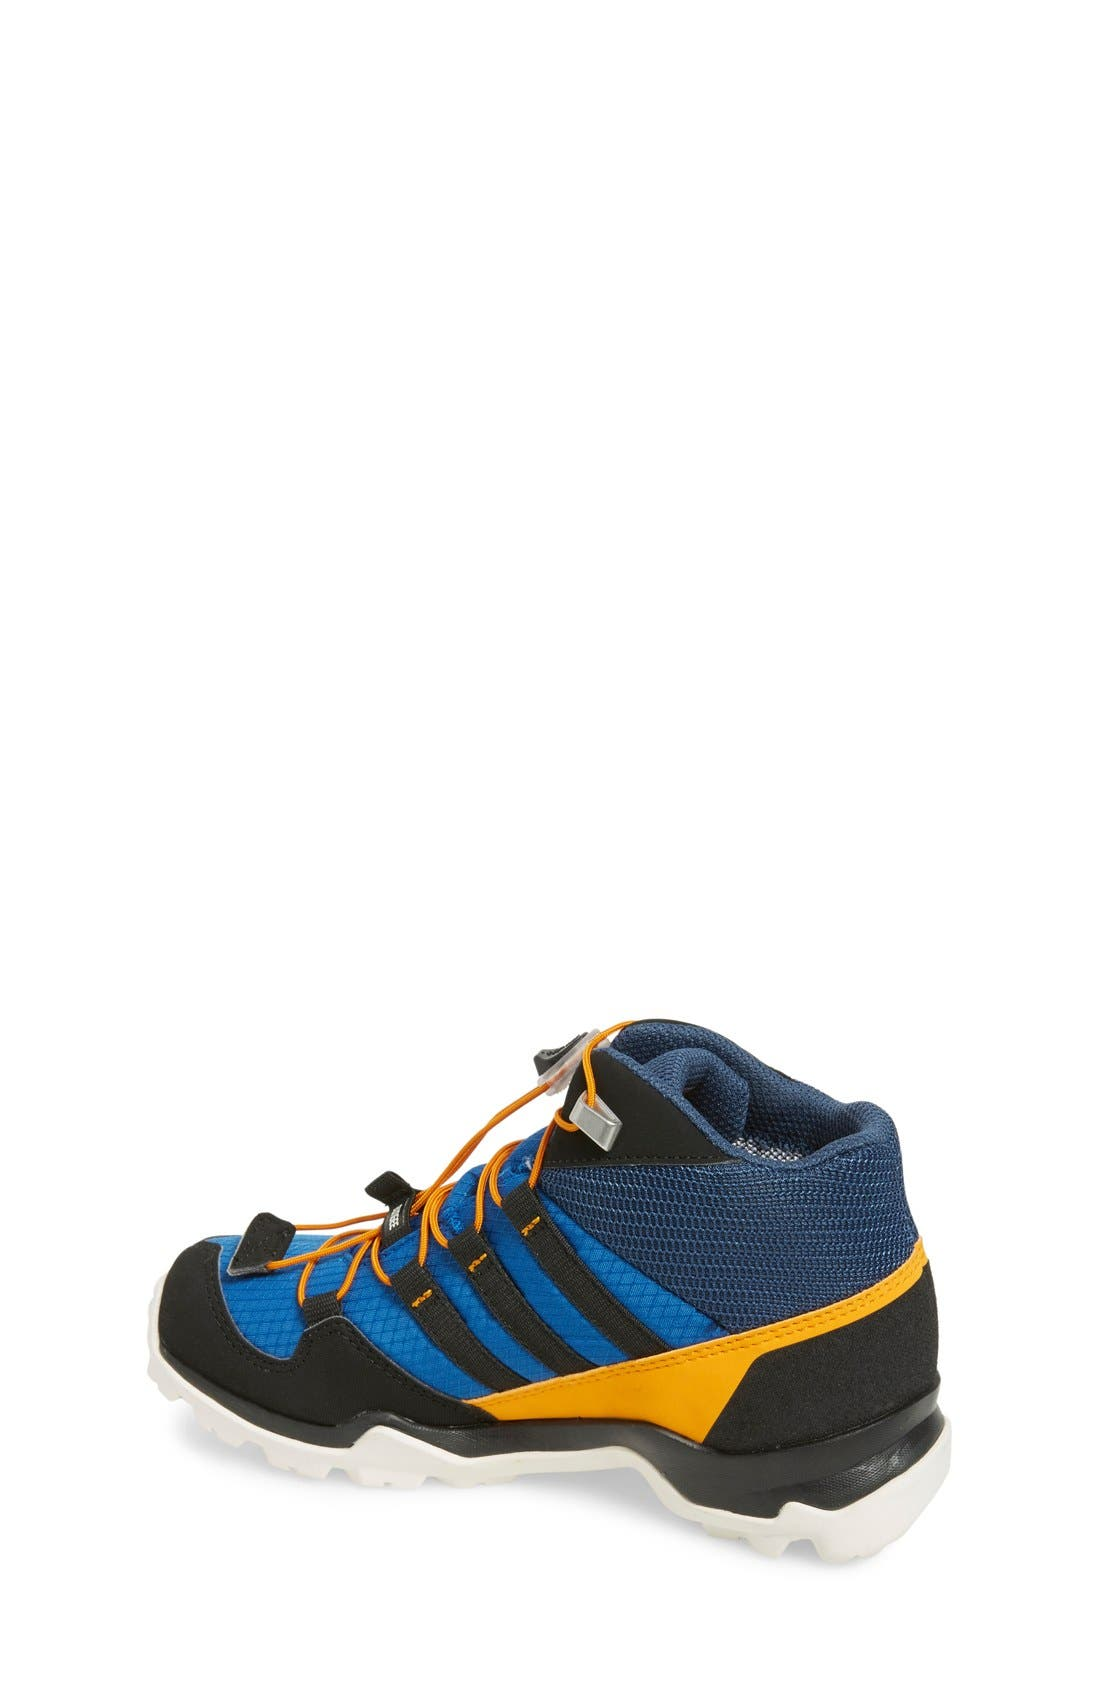 'Terrex Mid Gore-Tex' Hiking Shoe,                             Alternate thumbnail 2, color,                             Blue/ Black/ Orange